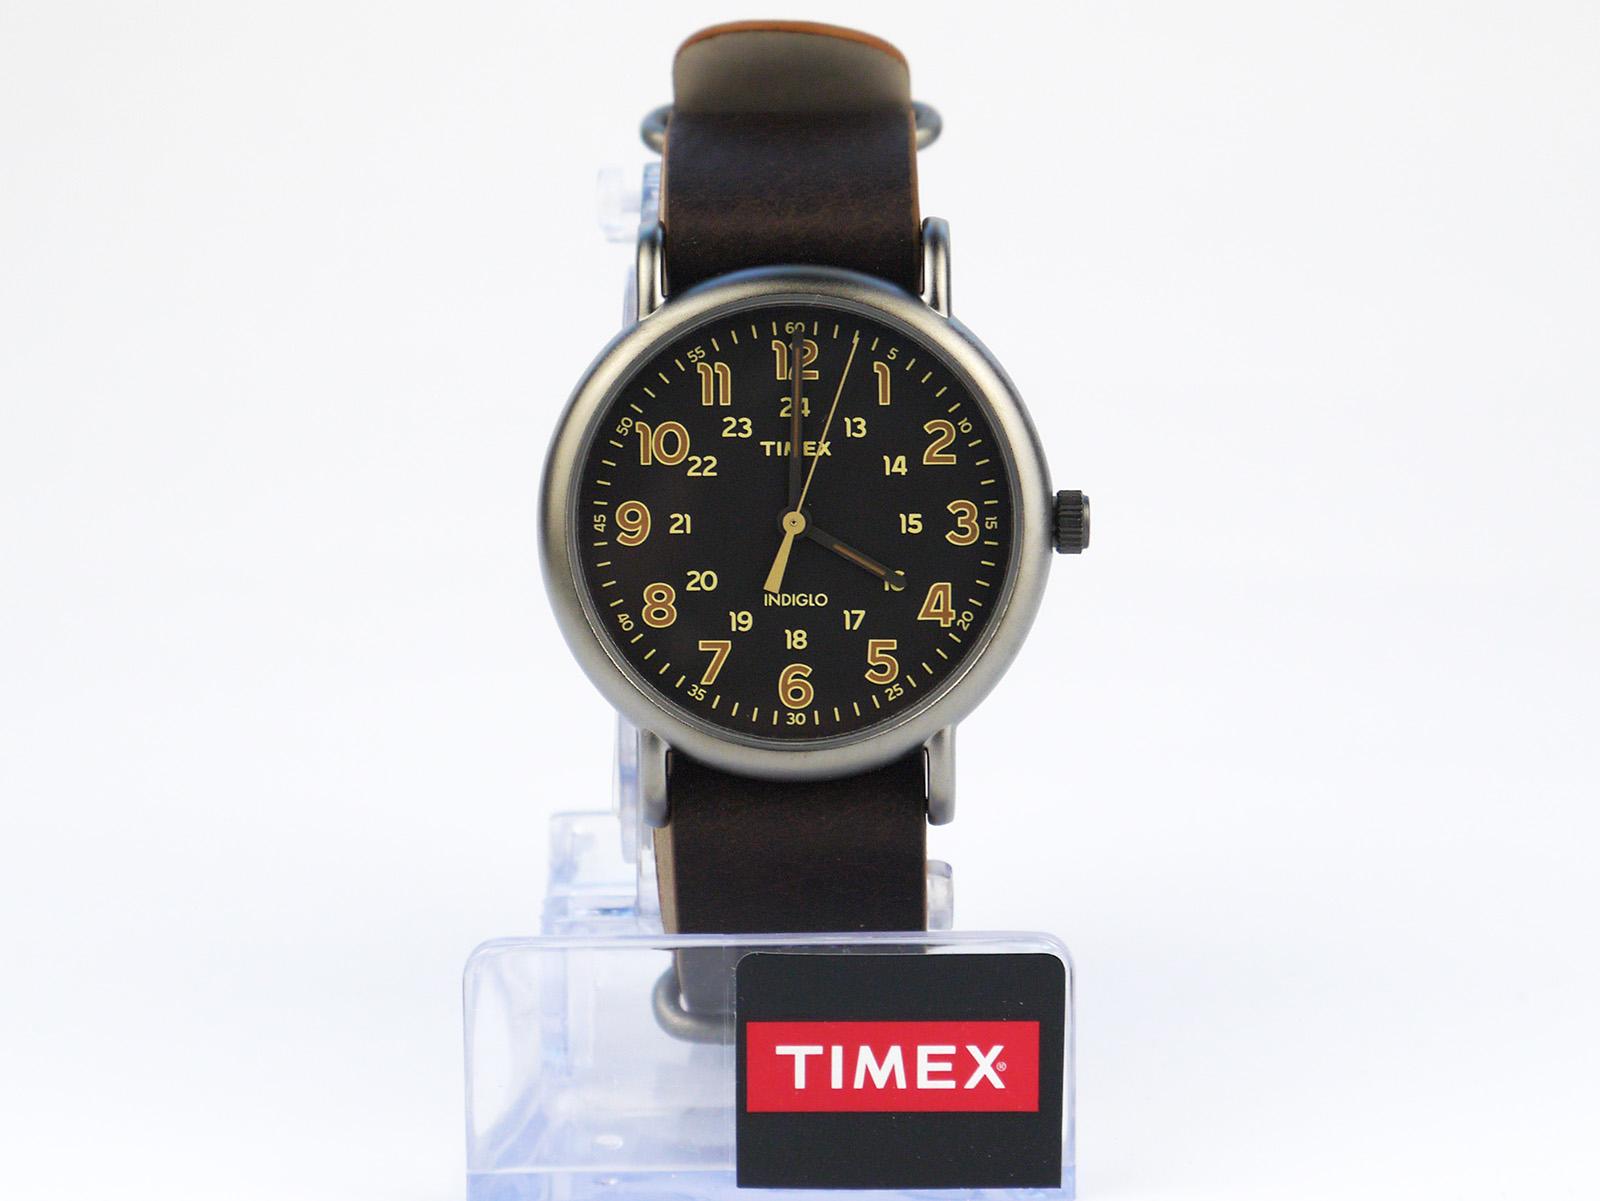 Timex Tw2p85800 Weekender Oversized Vintage Style Watch